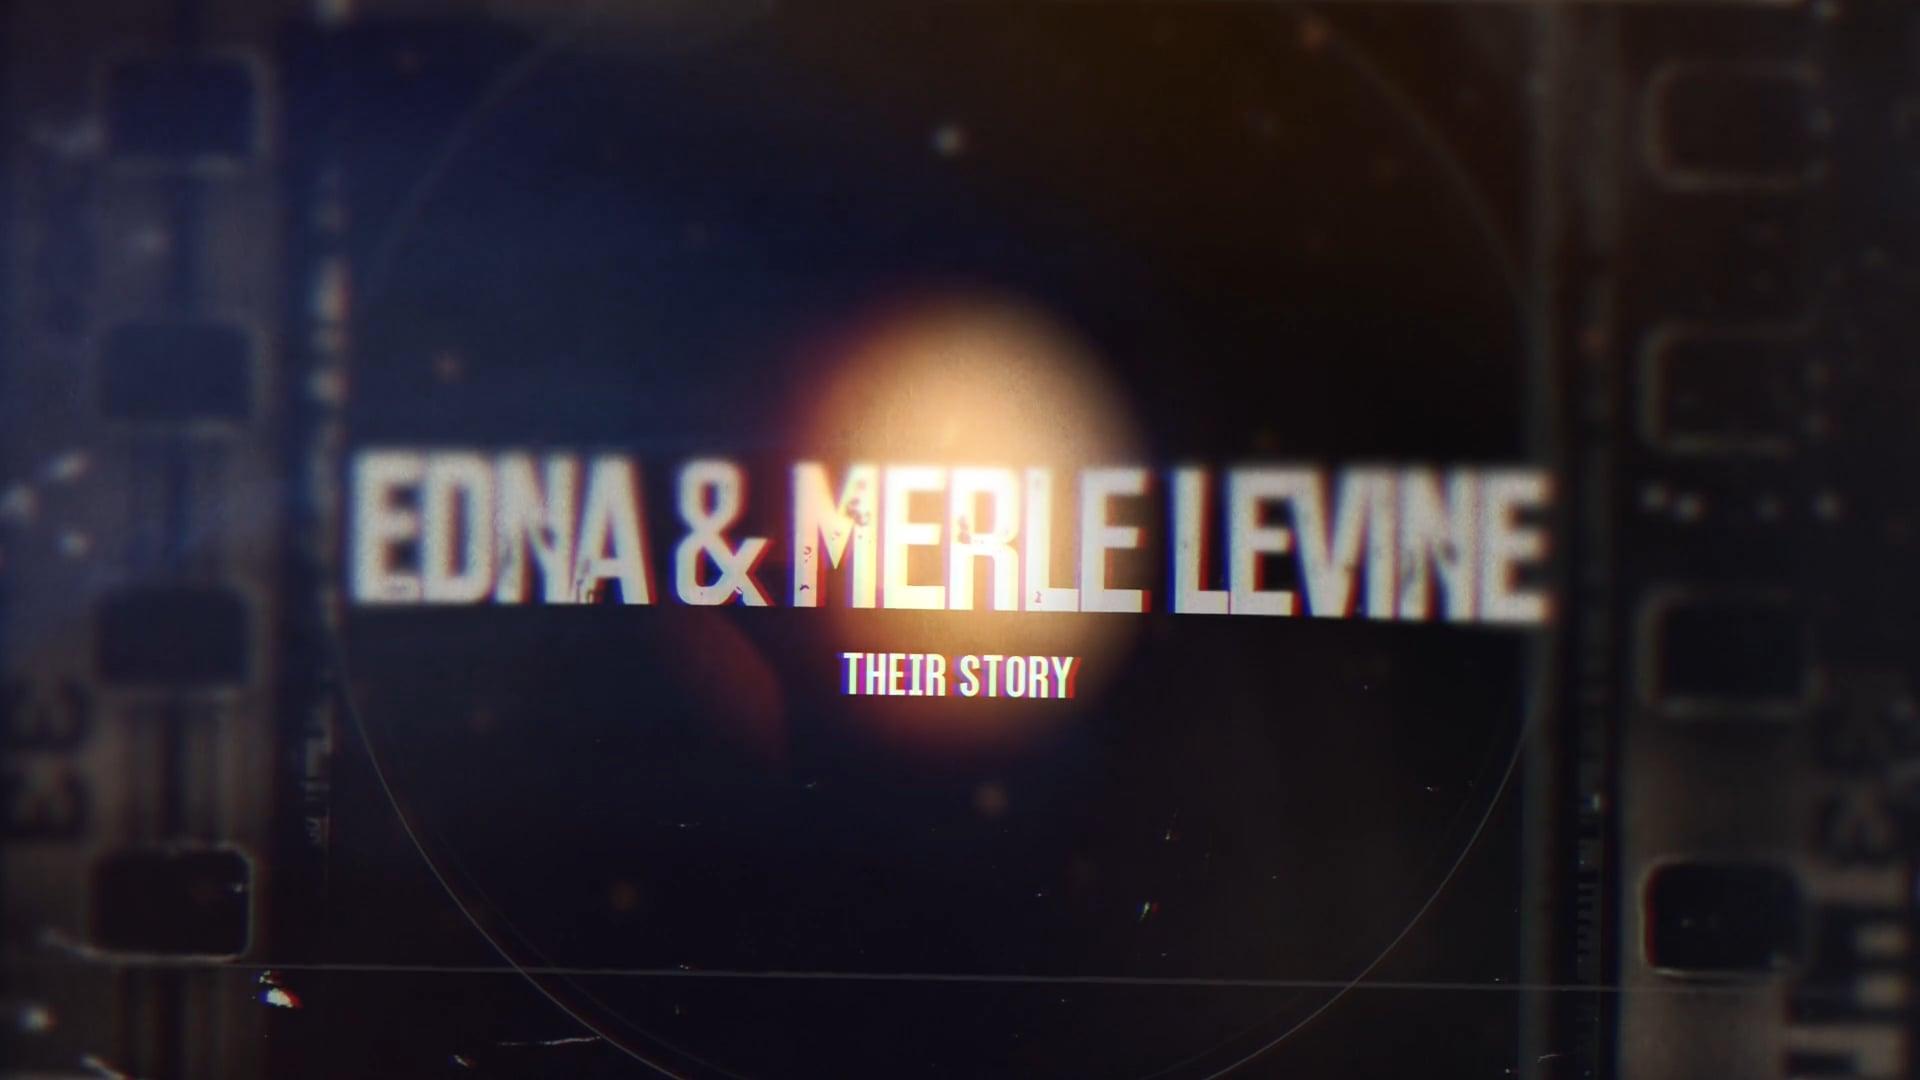 The Story of Edna & Merle